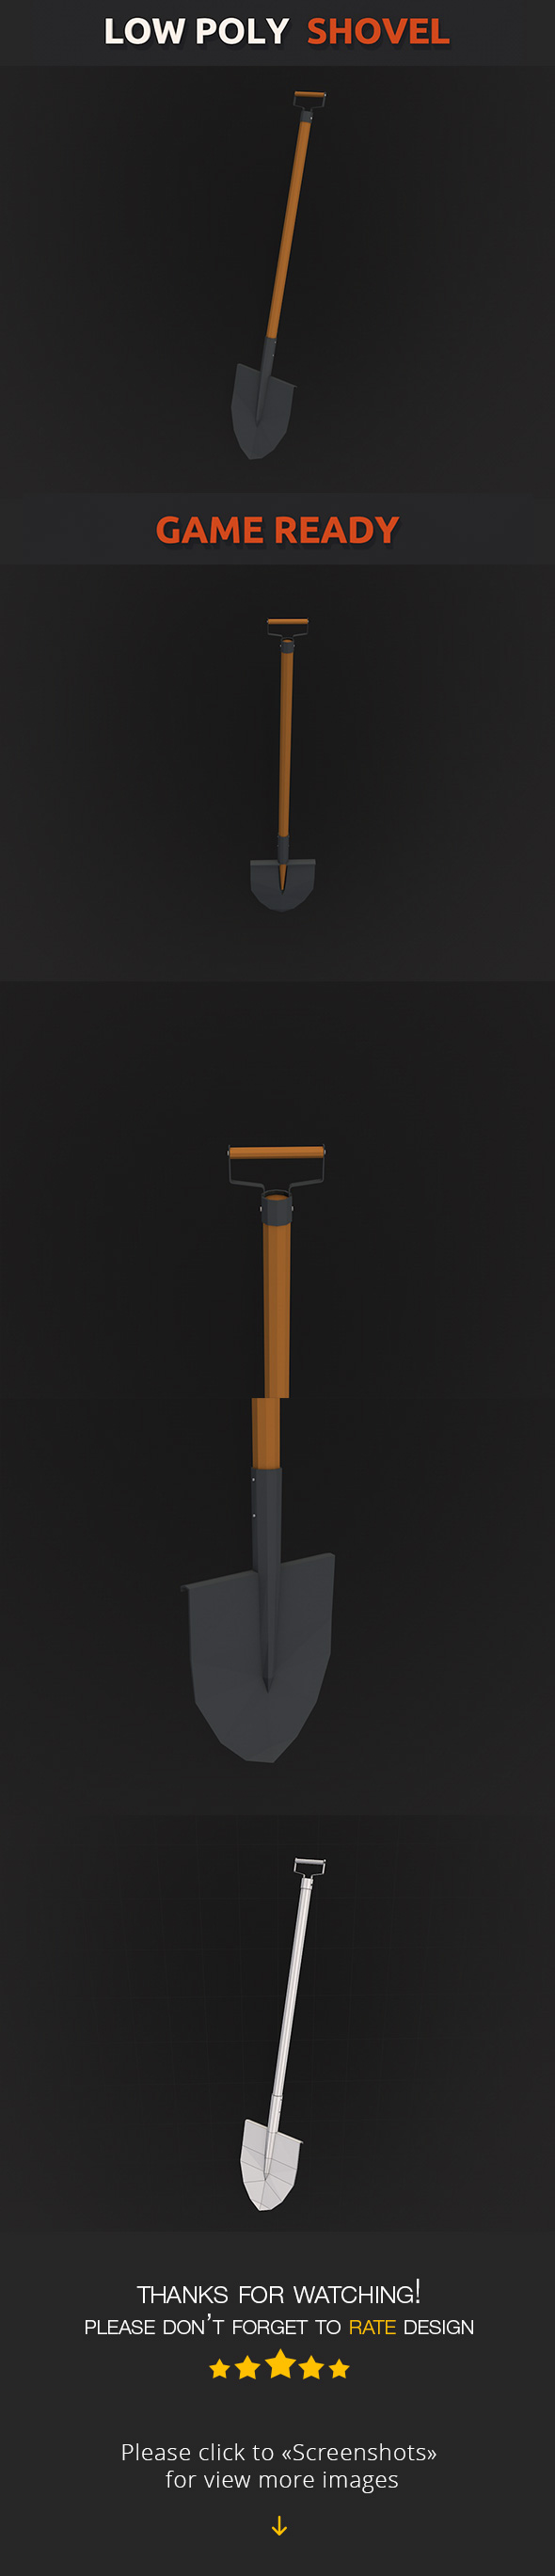 Low Poly Shovel - 3DOcean Item for Sale